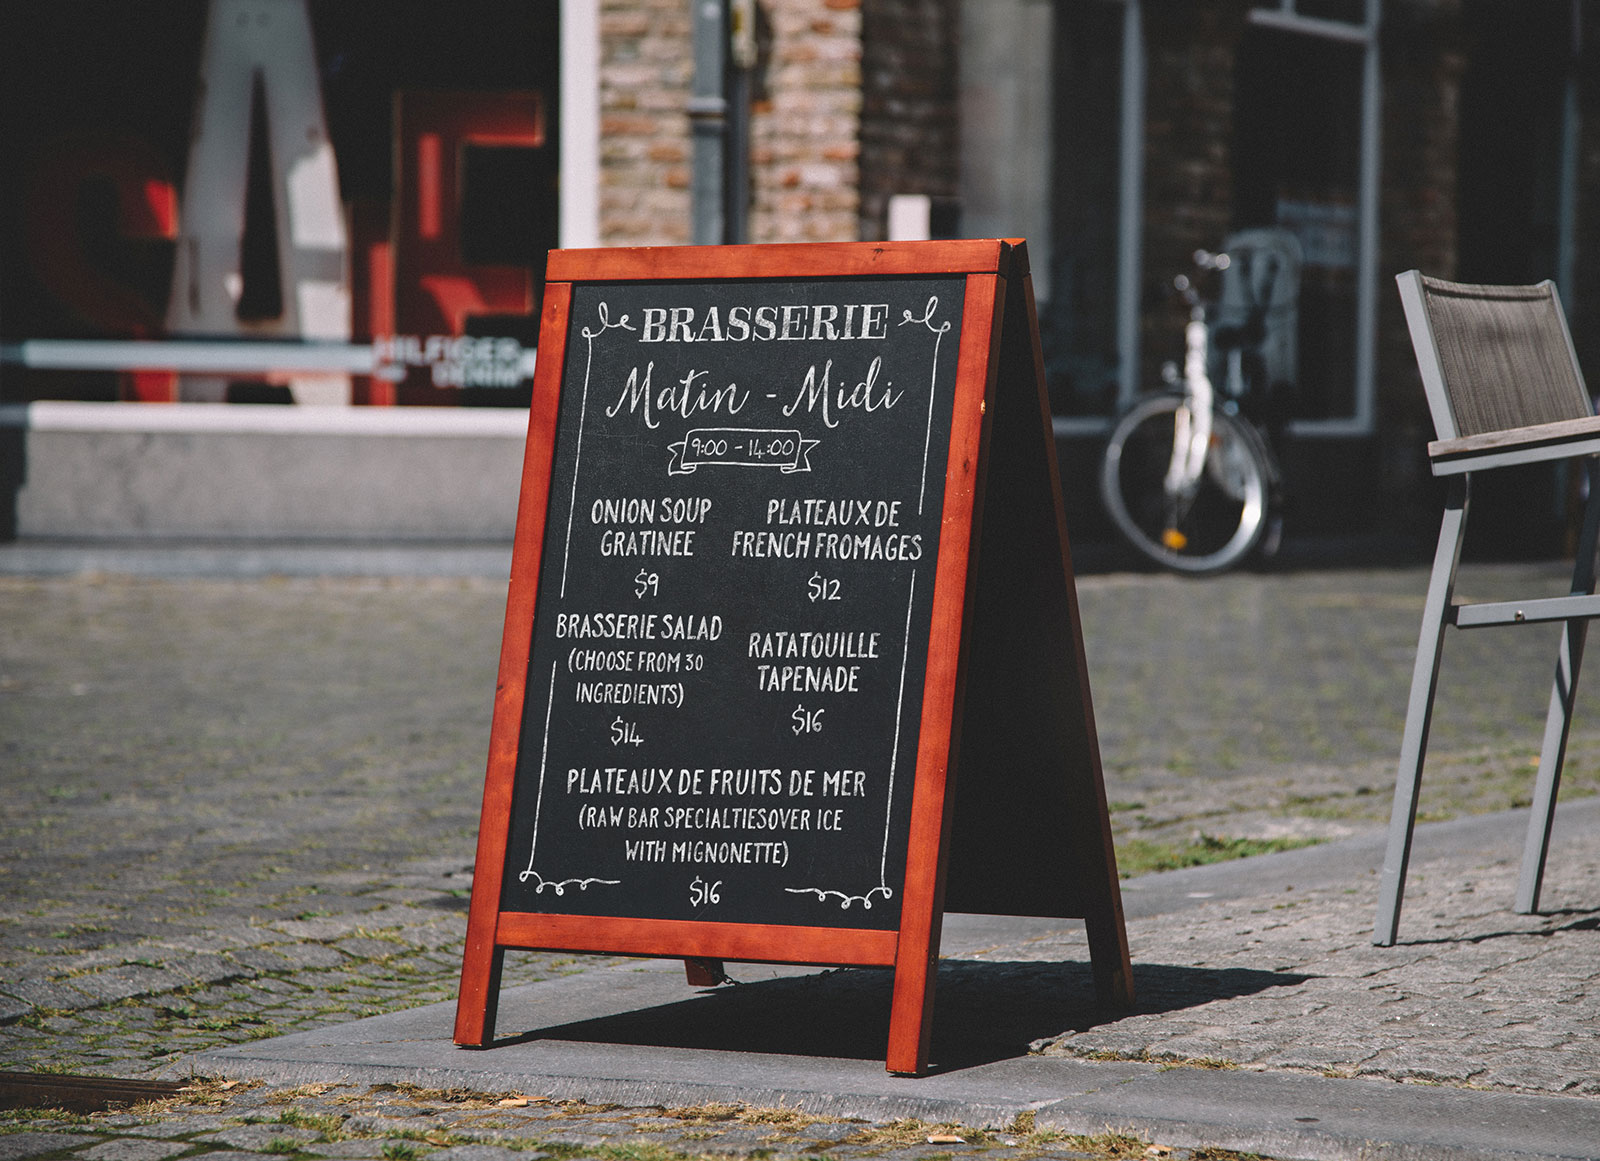 Free-A-Frame-Chalkboard-Restaurant-Menu-Mockup-PSD